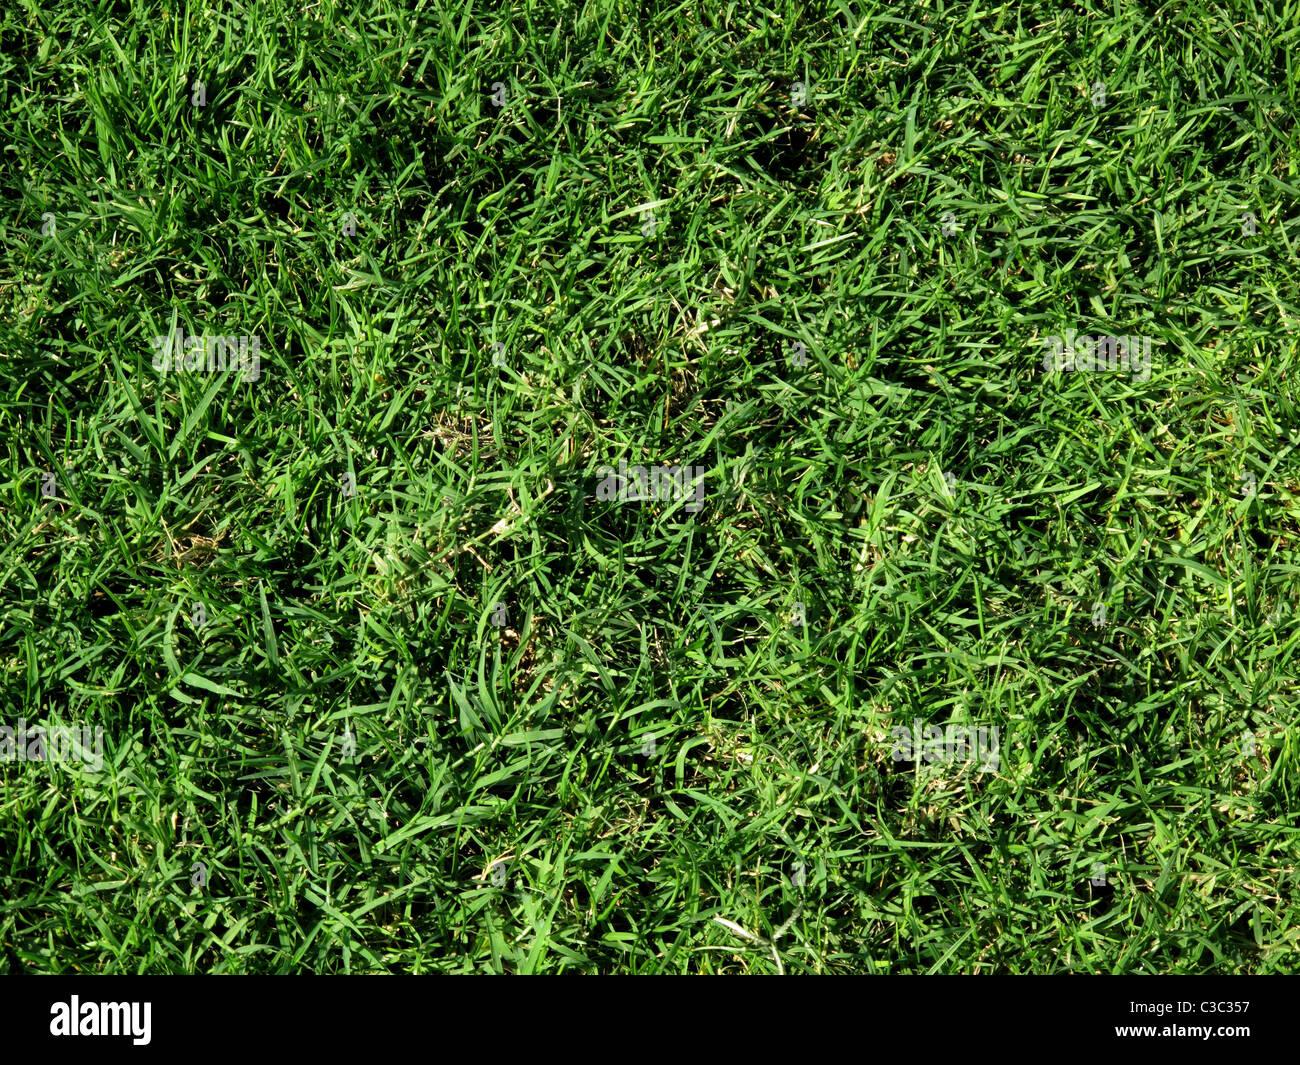 Bermuda Grass lawn (Cynodon dactylon), DUBAÏ, ÉMIRATS ARABES UNIS Photo Stock